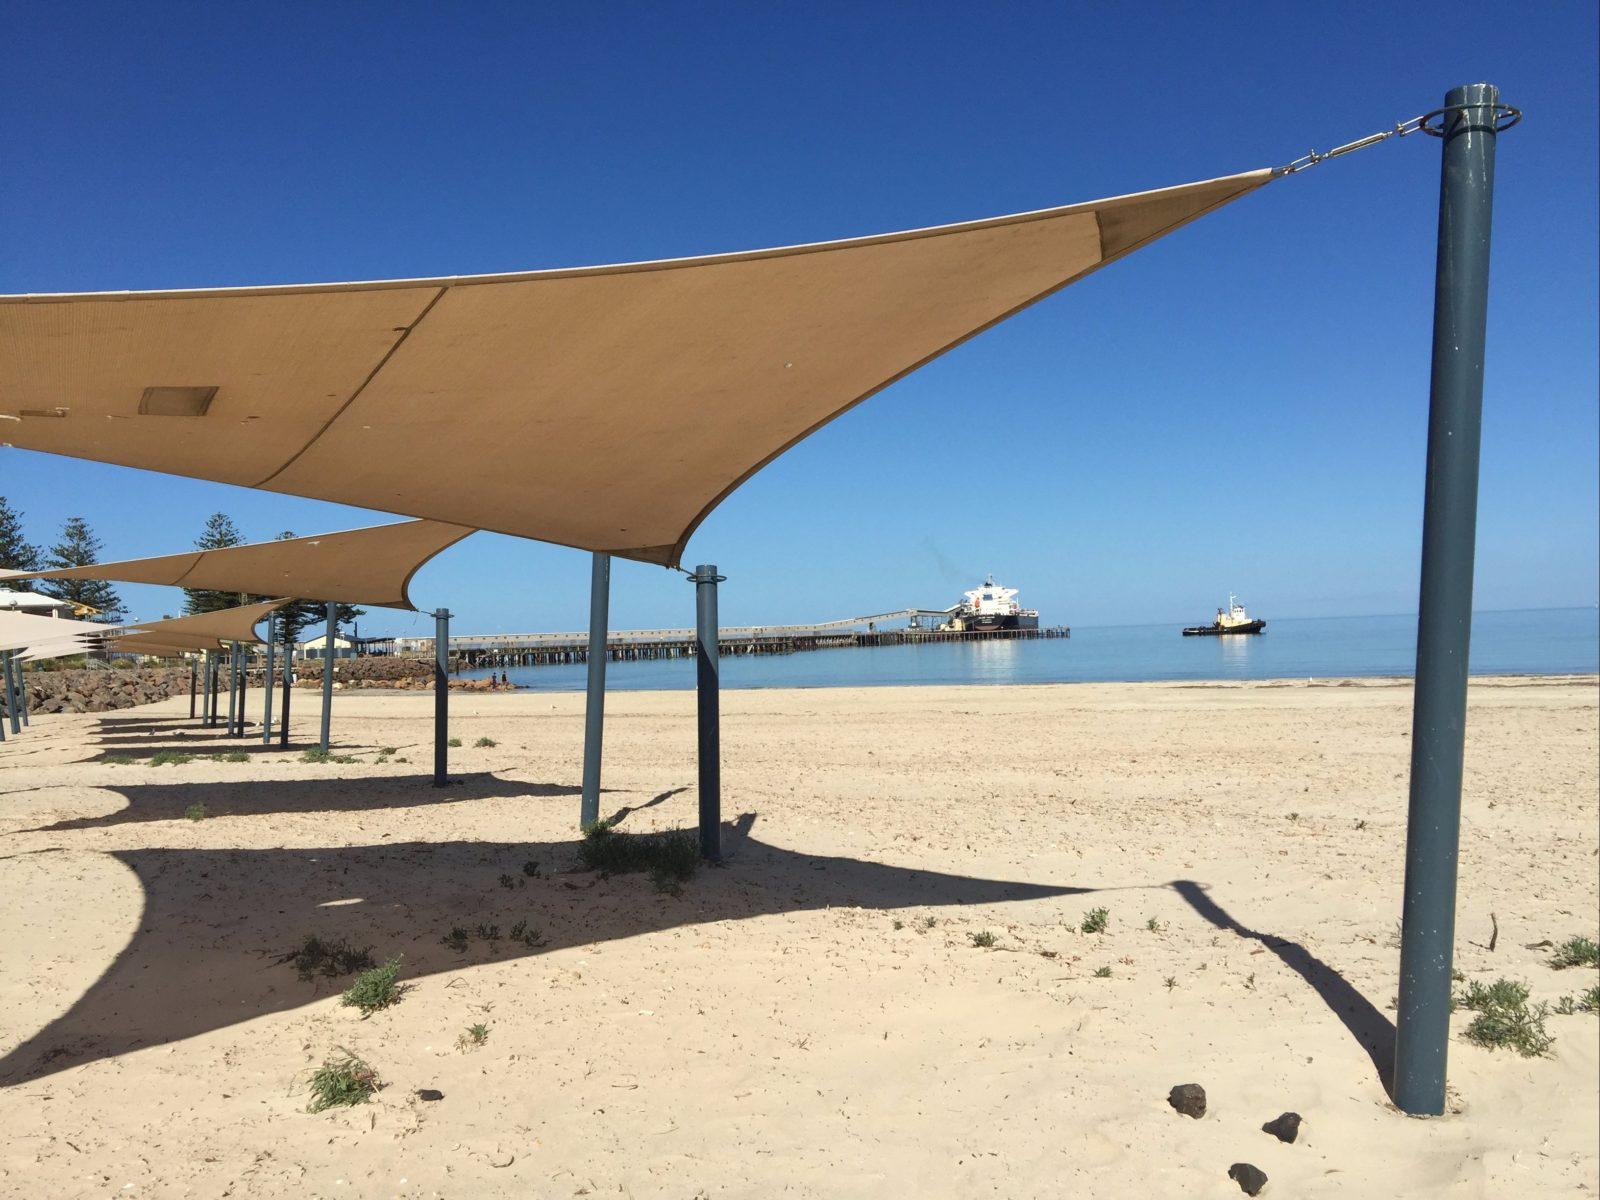 Office Beach, Wallaroo